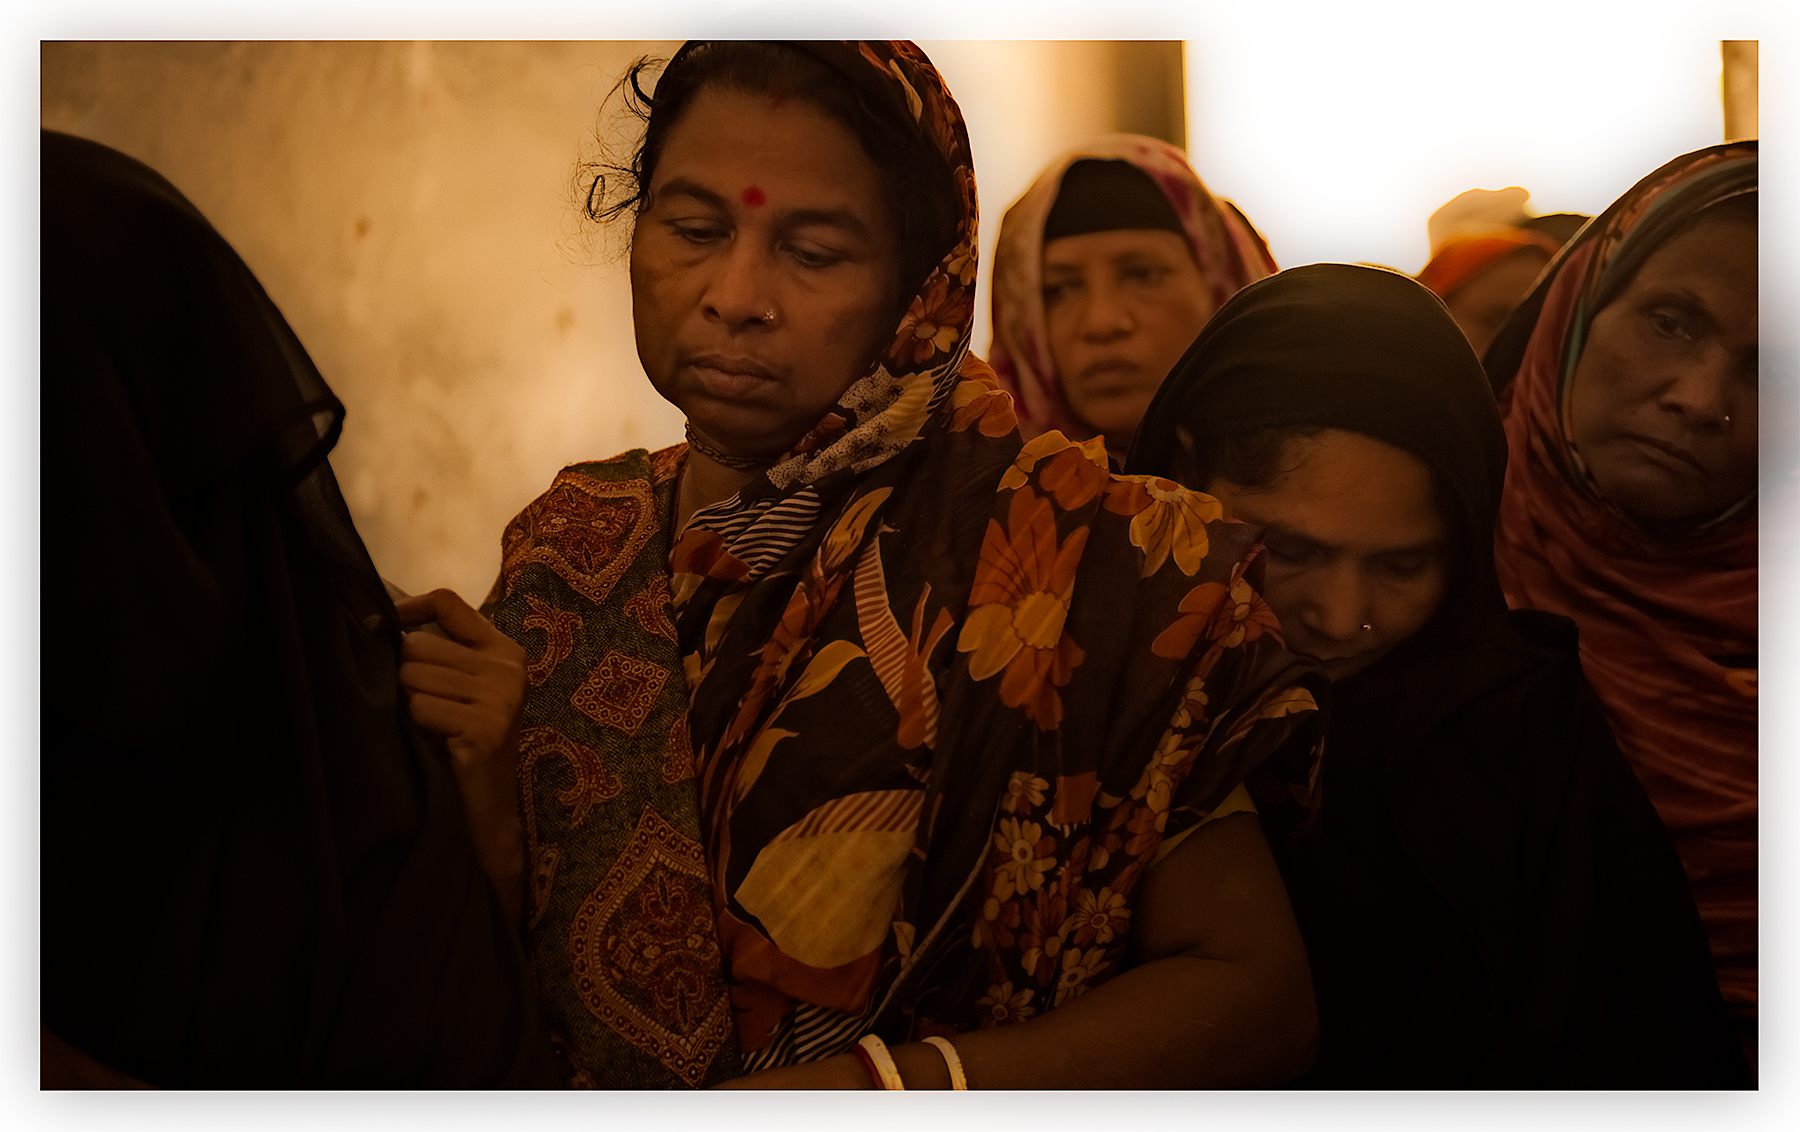 Women with cataracts, waiting. Bangladesh